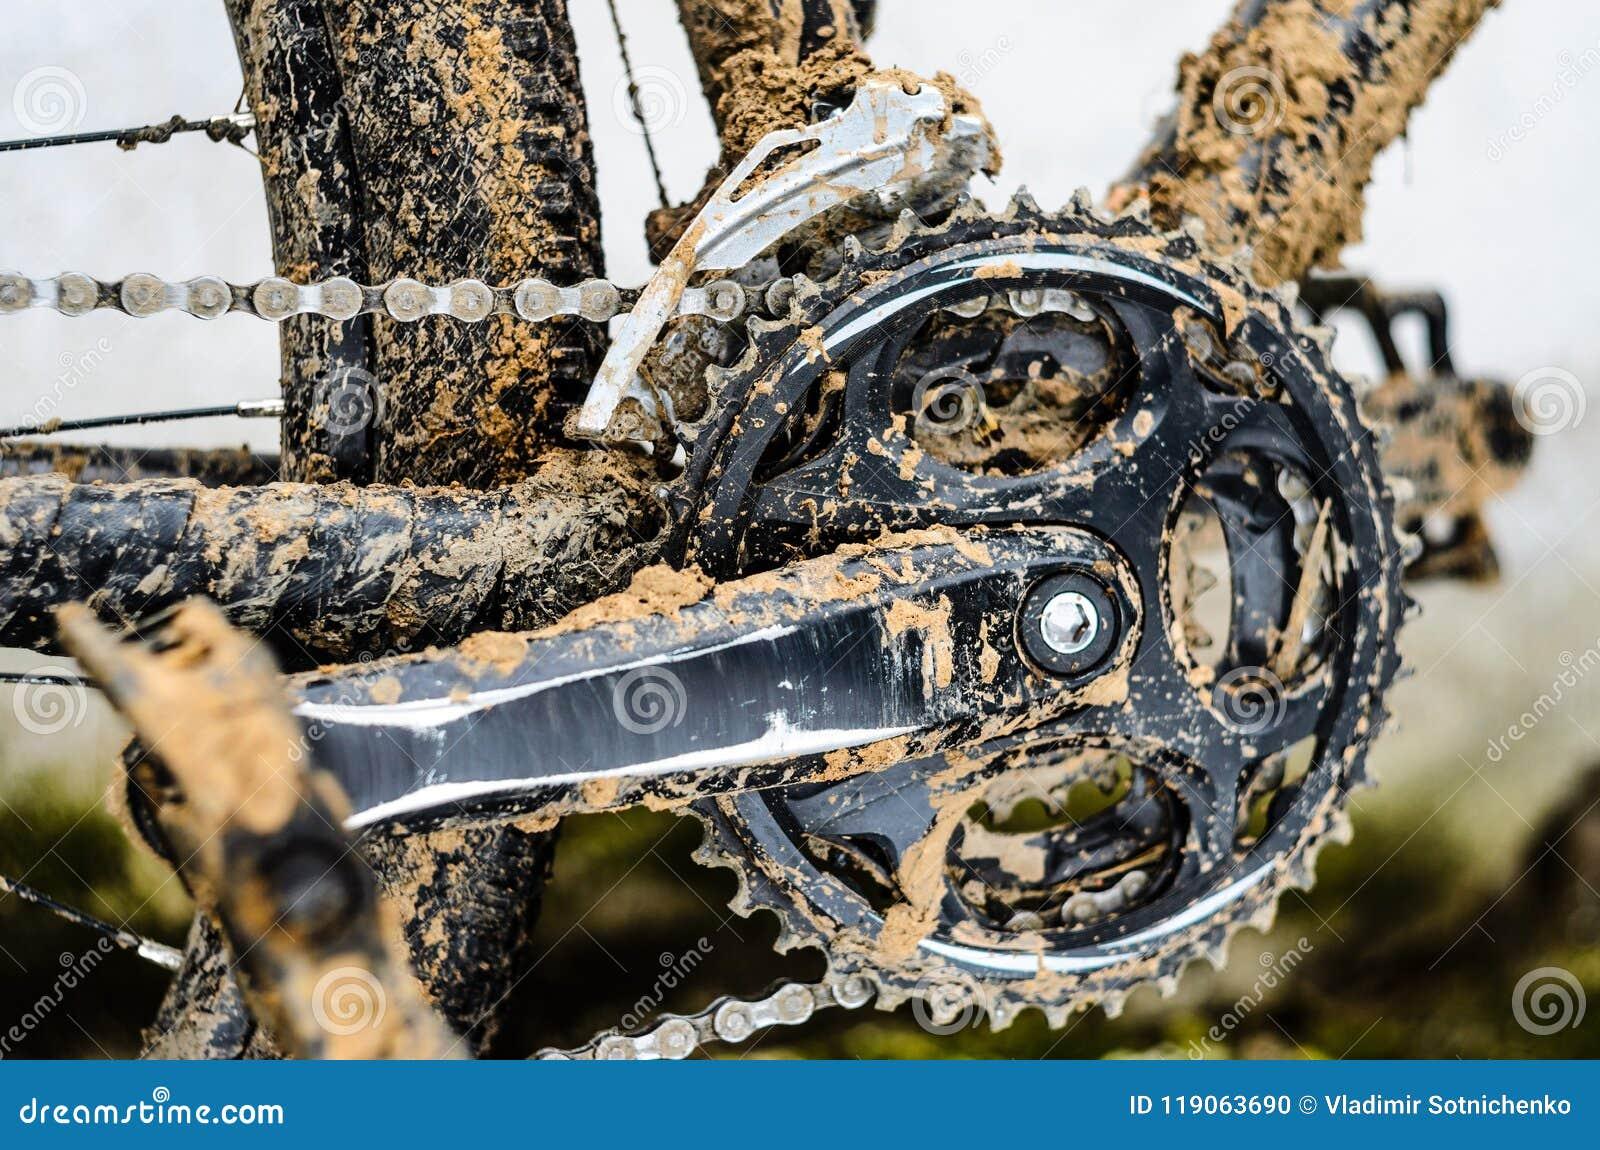 Mountain Bike Transmission In Mud Stock Photo Image Of Mechanism Dirt 119063690